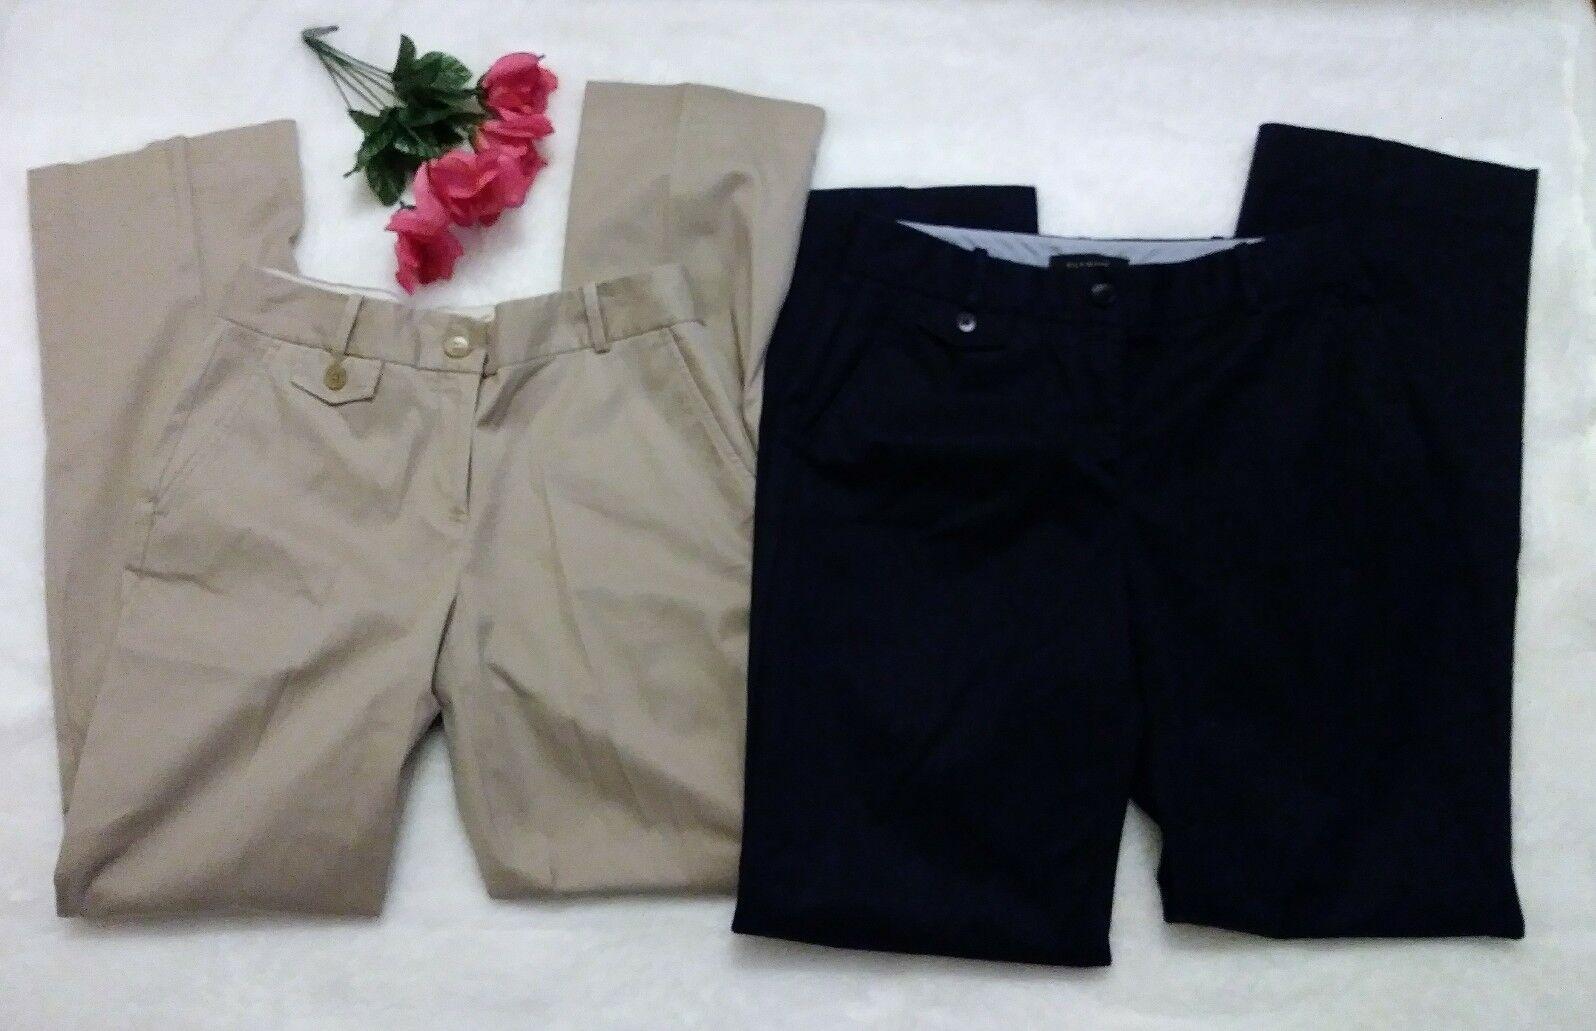 TALBOTS Lot x 2 Curvy Fit Khaki Beige & Navy bluee Stretch Twill Pants Size SZ 2